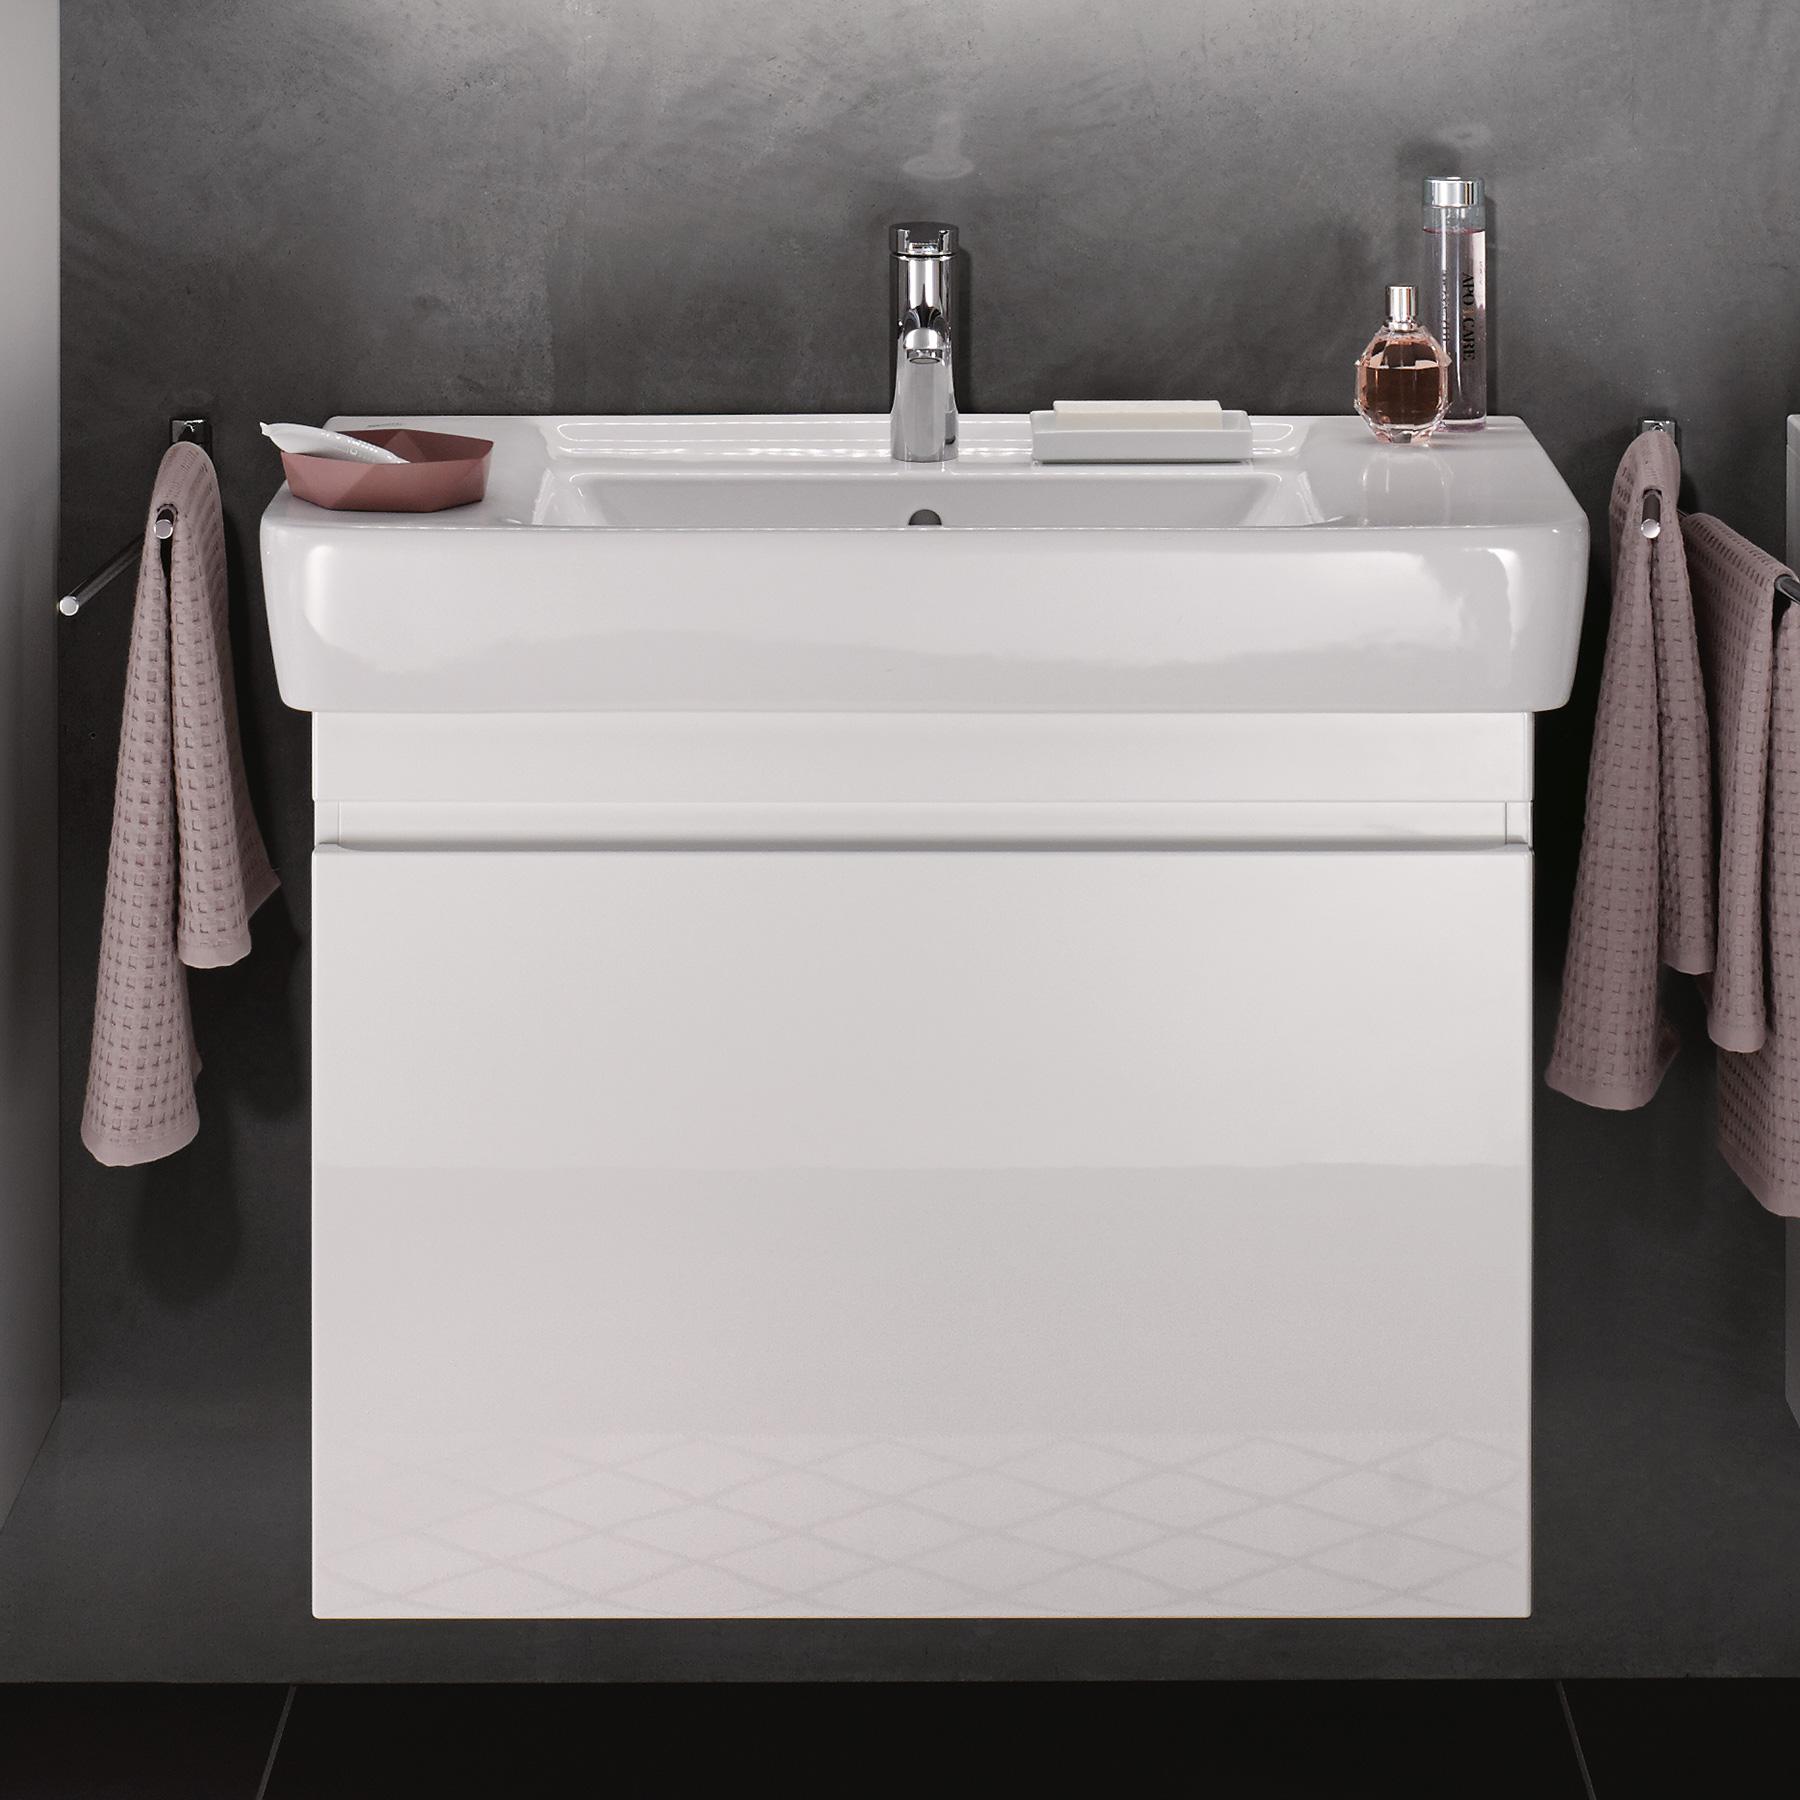 keramag renova nr 1 plan waschtischunterschrank b 77 6 h. Black Bedroom Furniture Sets. Home Design Ideas